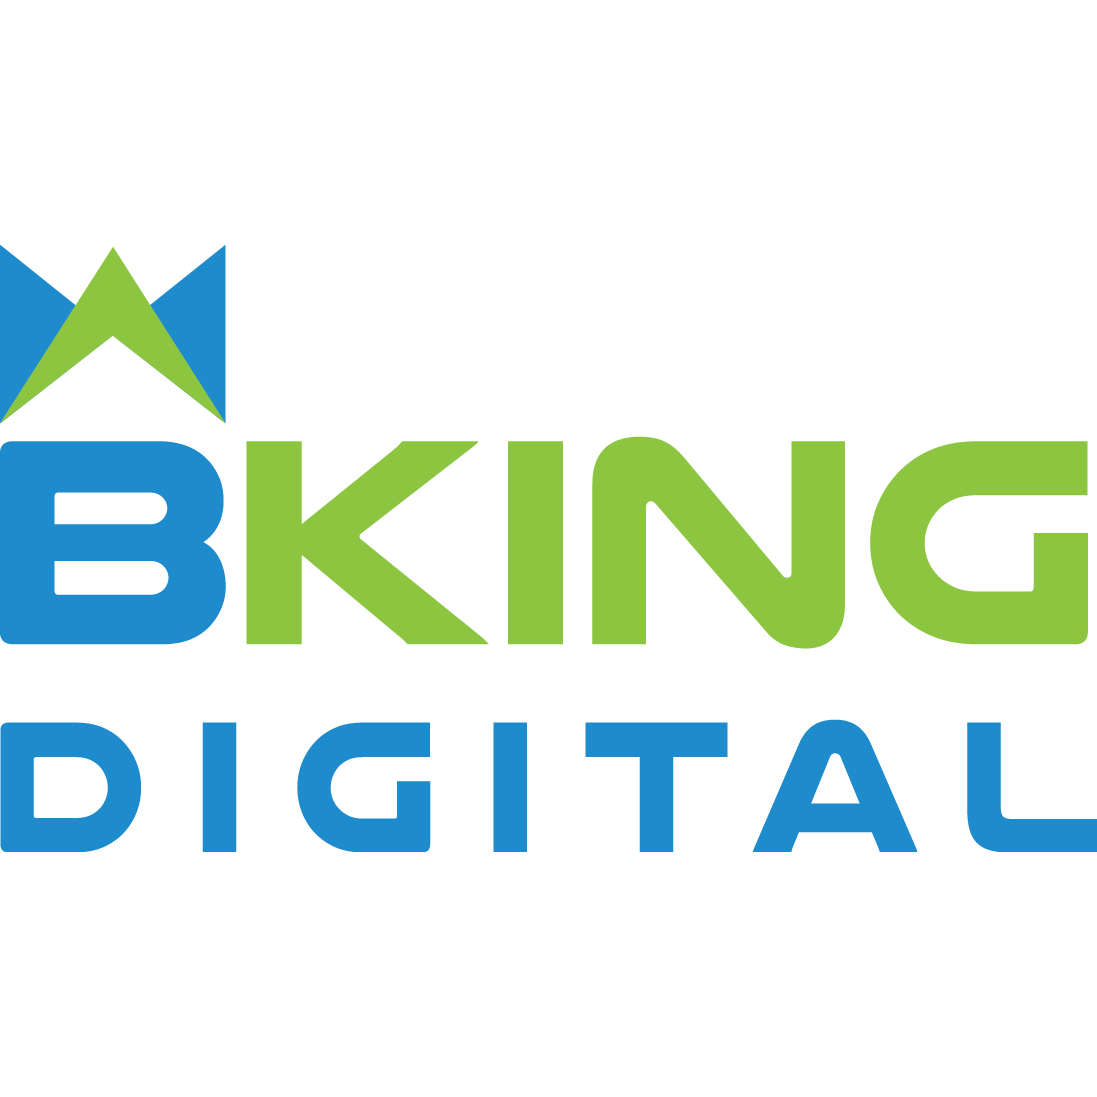 B King Digital